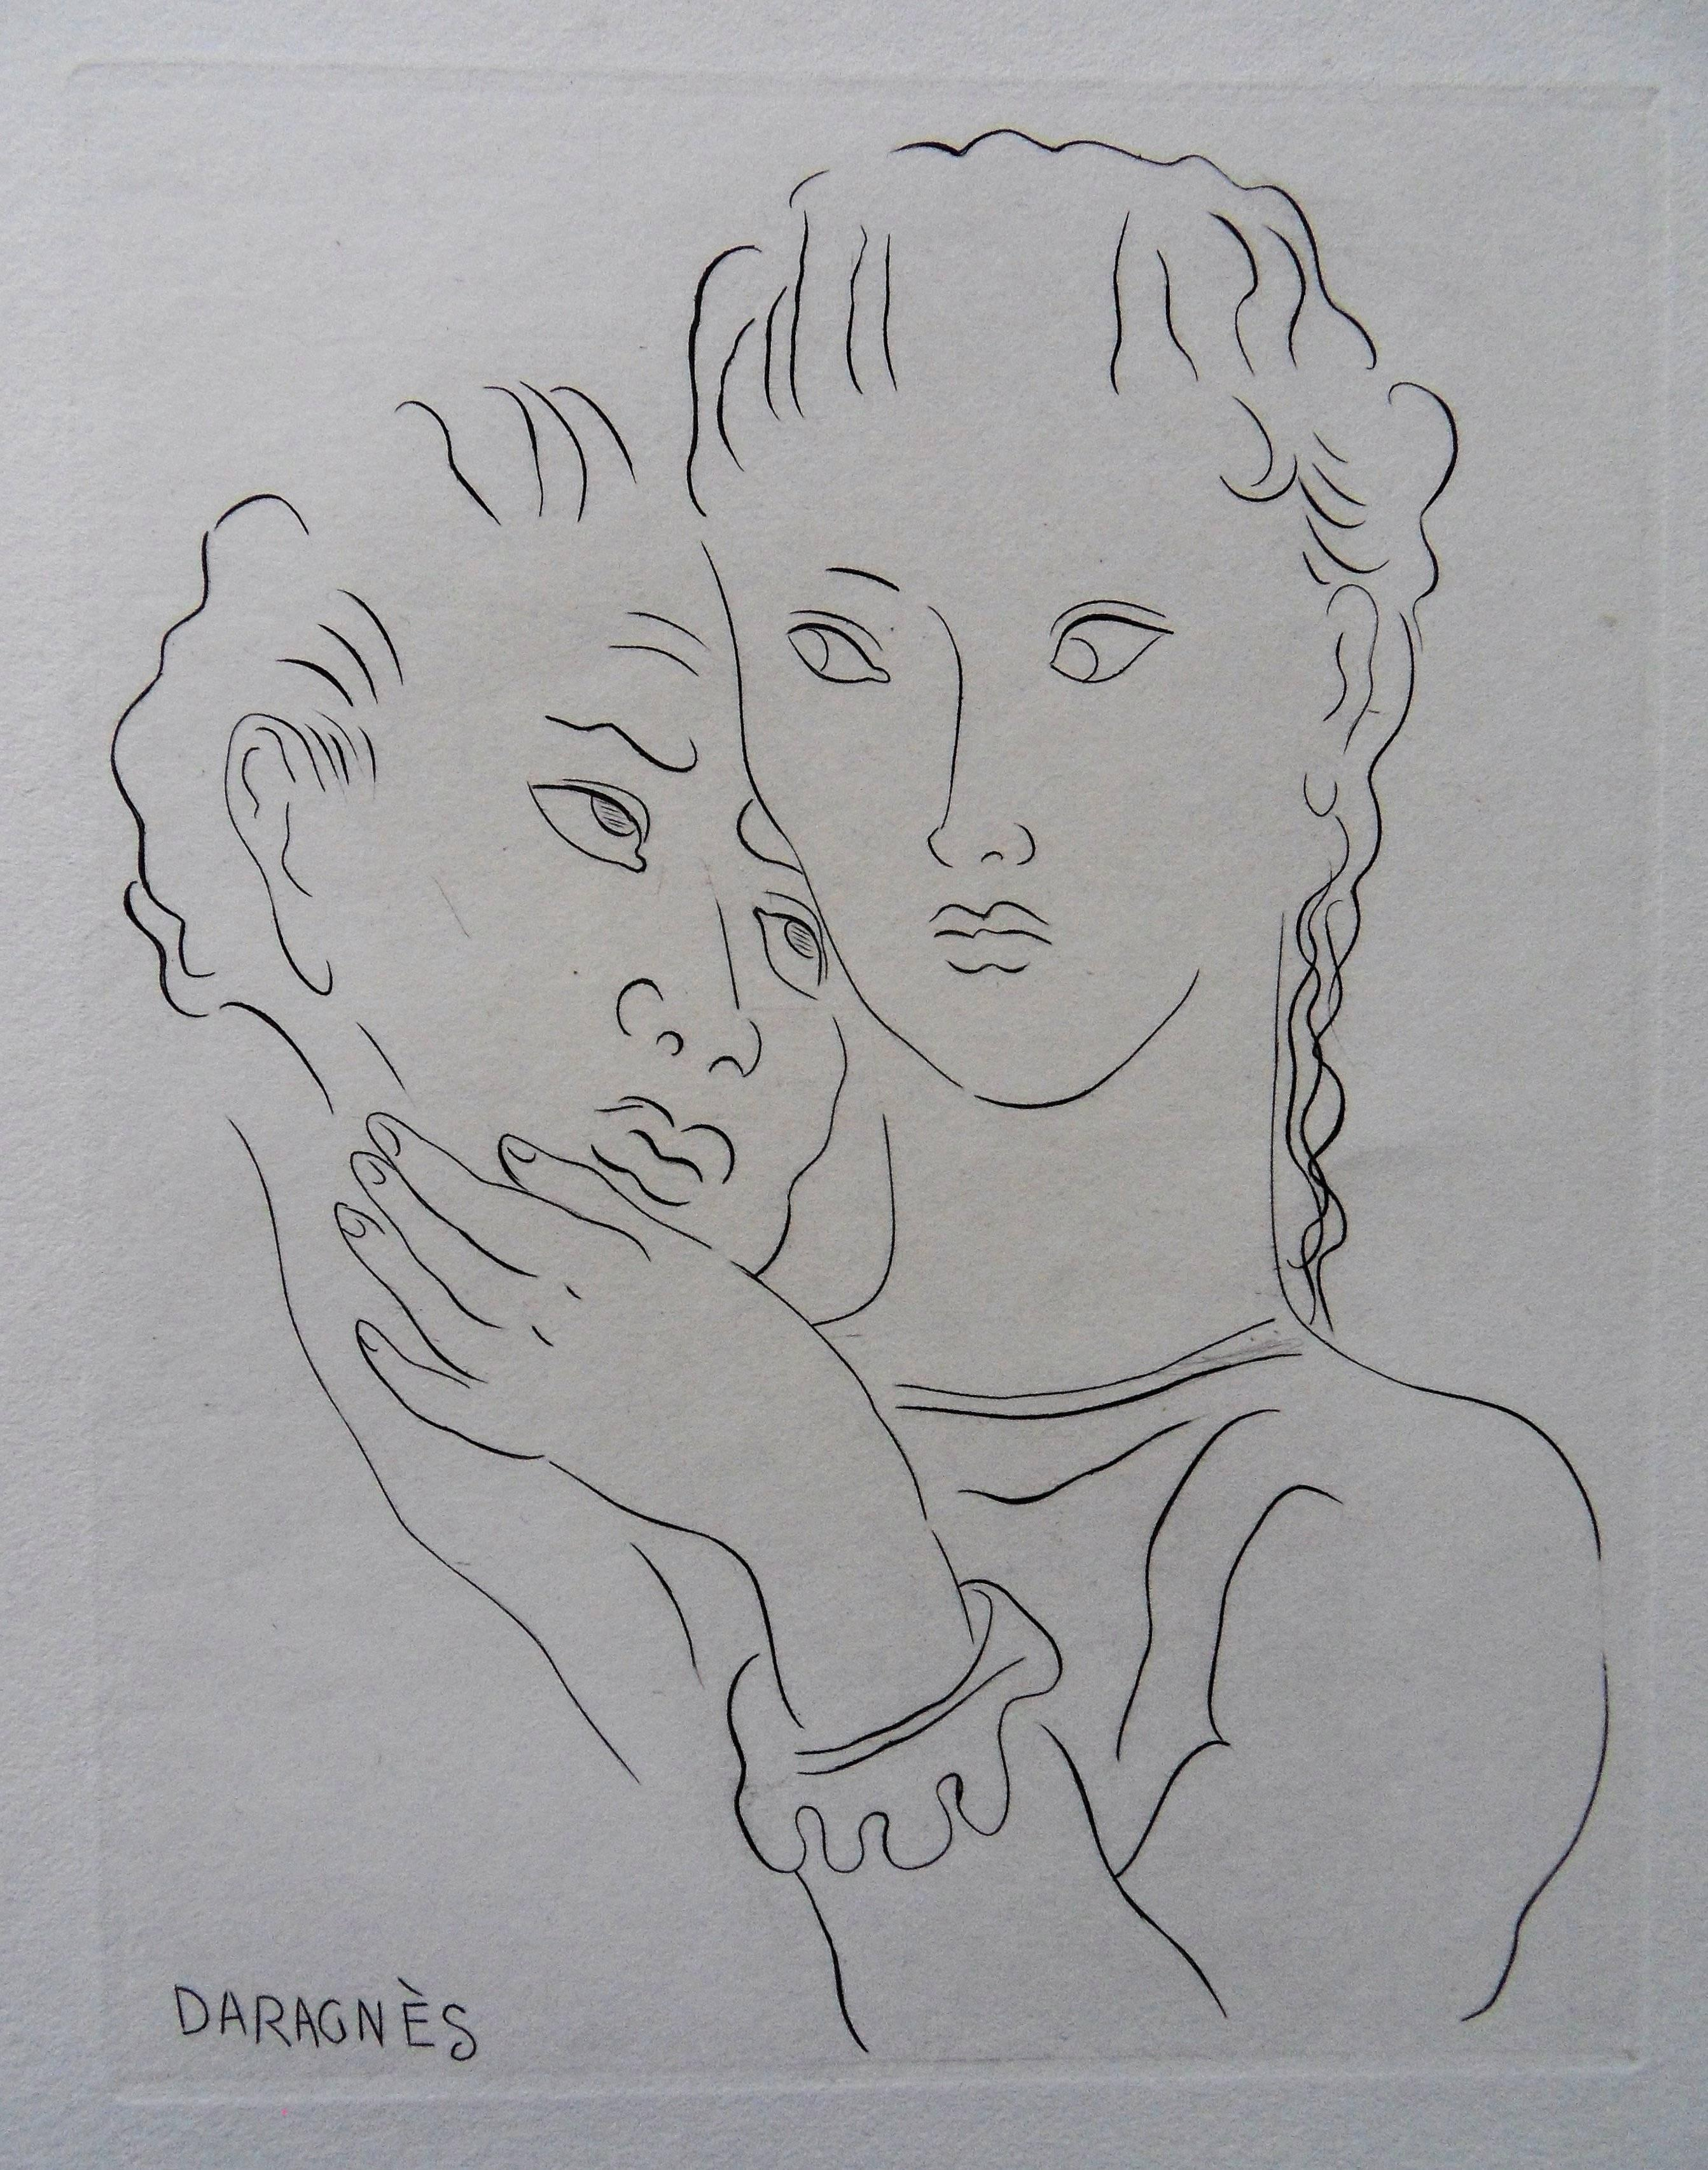 The Hug - Original etching, 1943